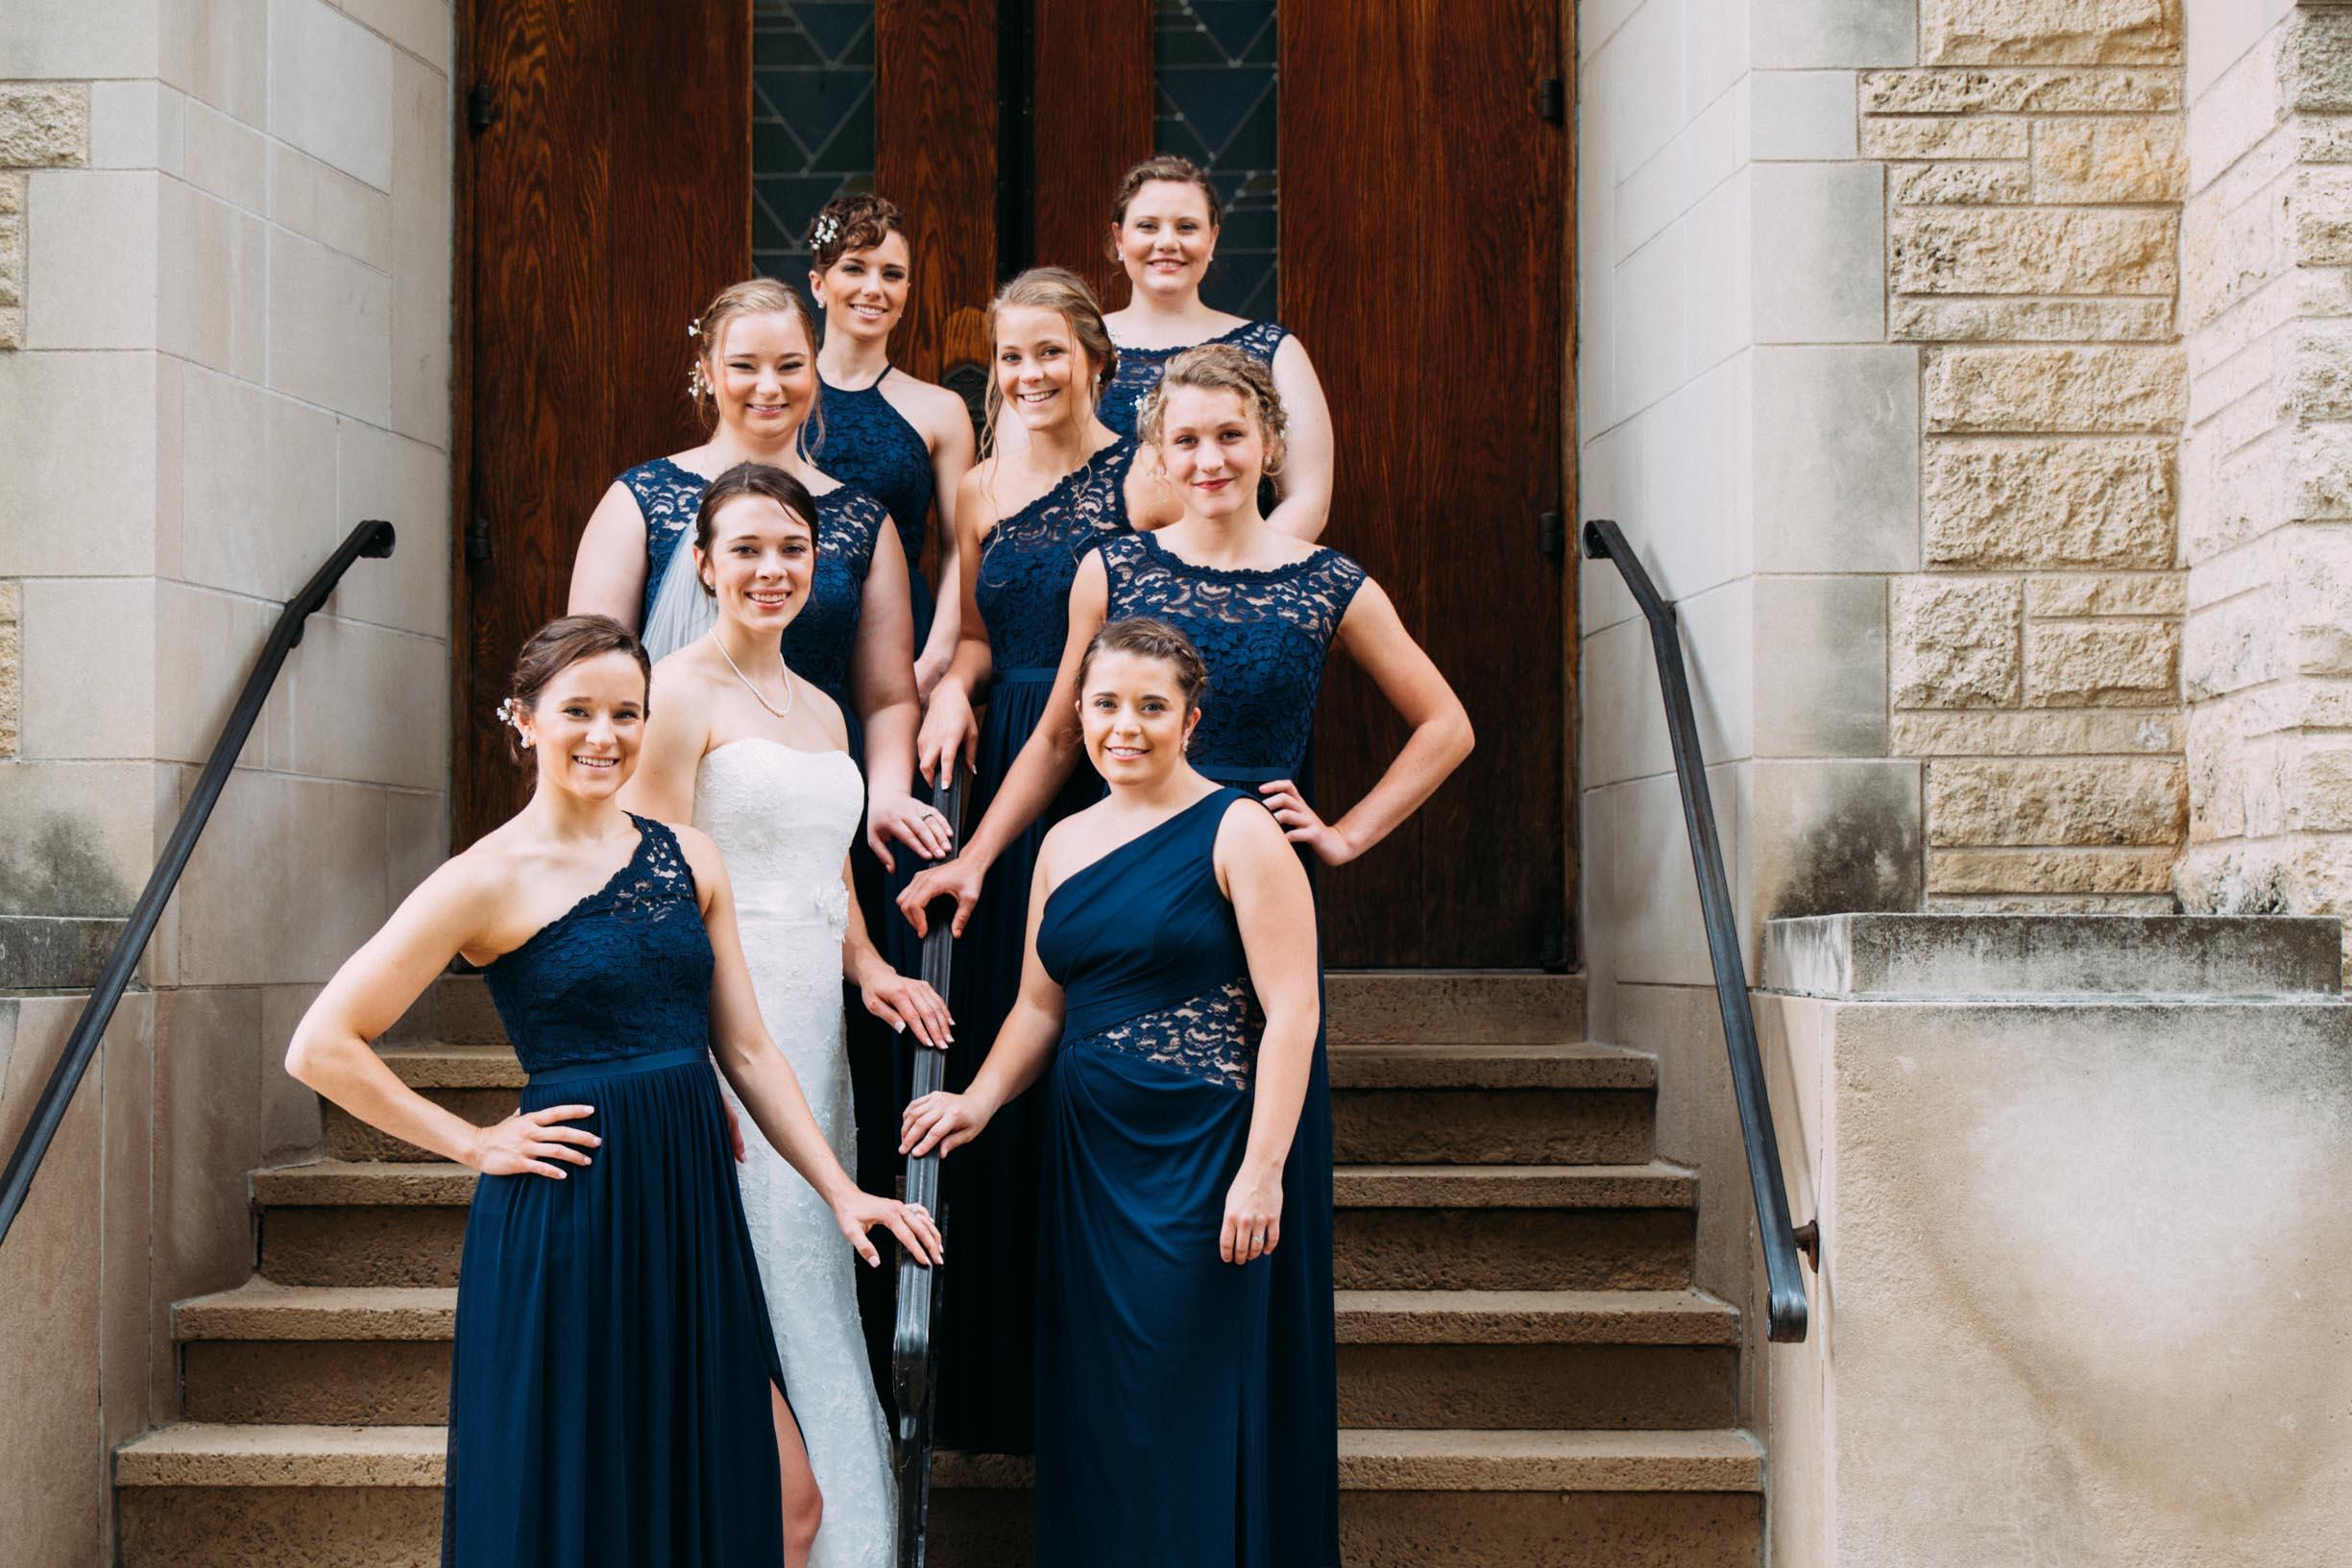 9-Lindsey Jake Wedding Party Winona.jpg